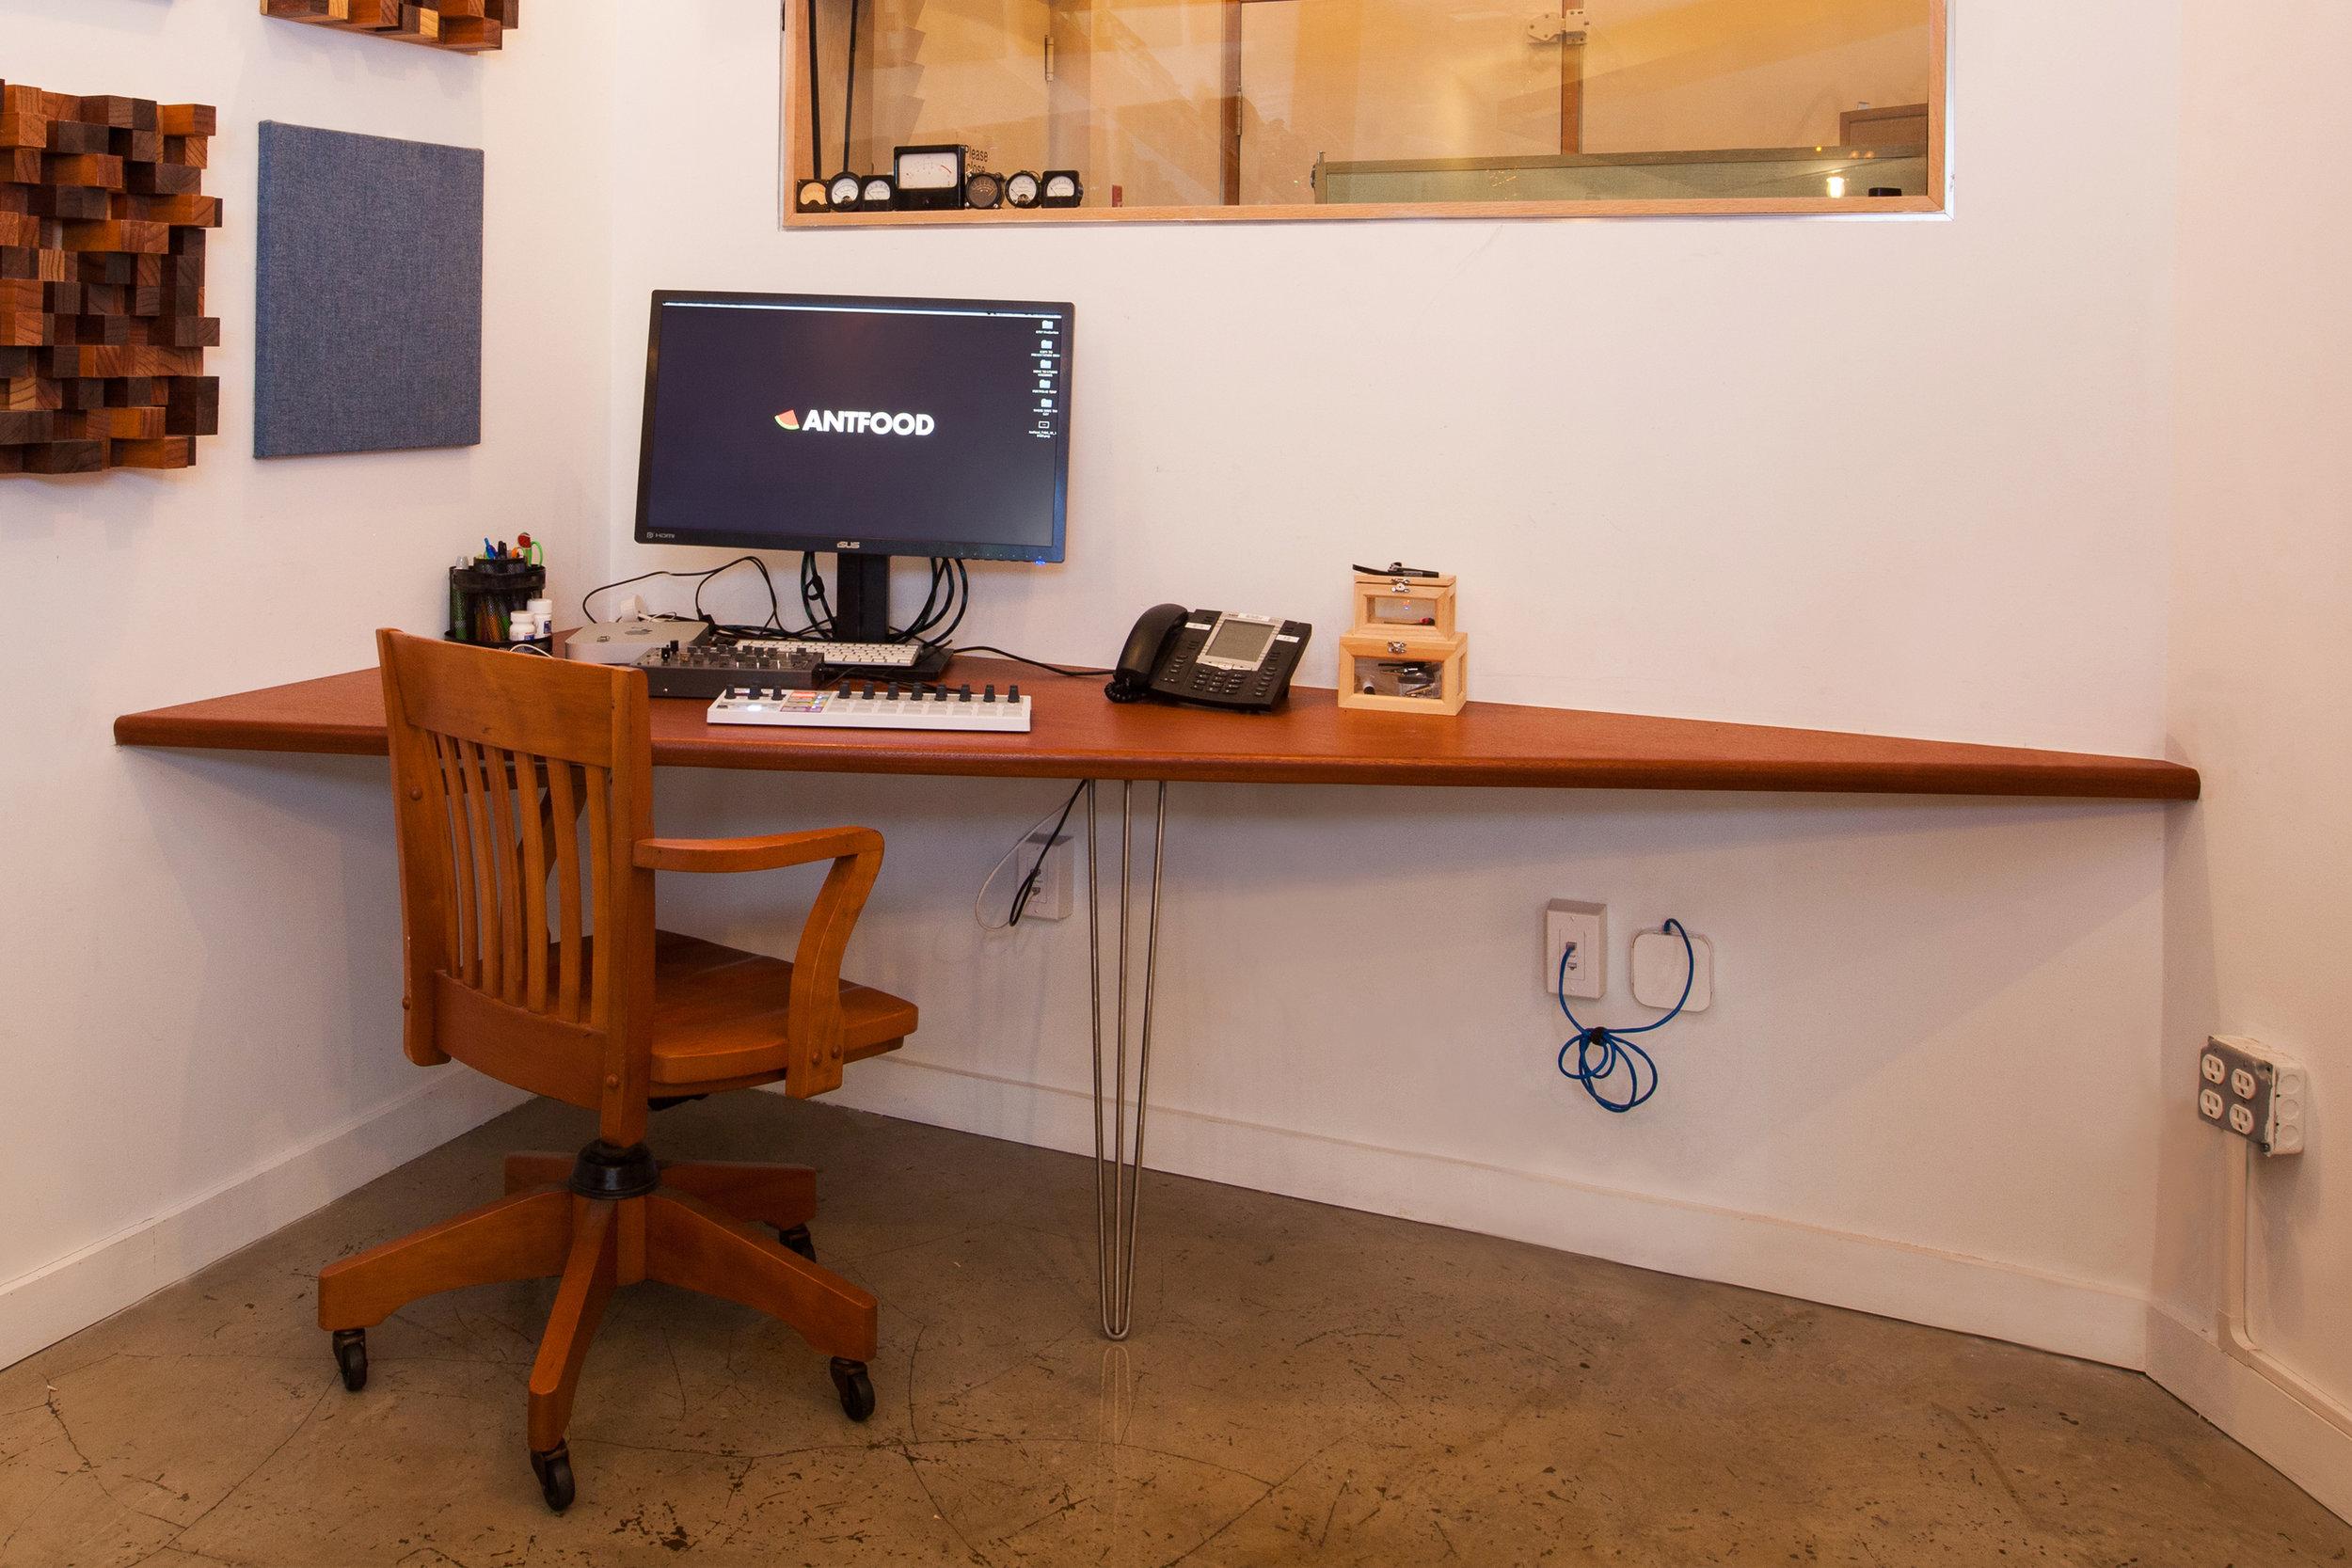 Antfood recording studio5.jpg